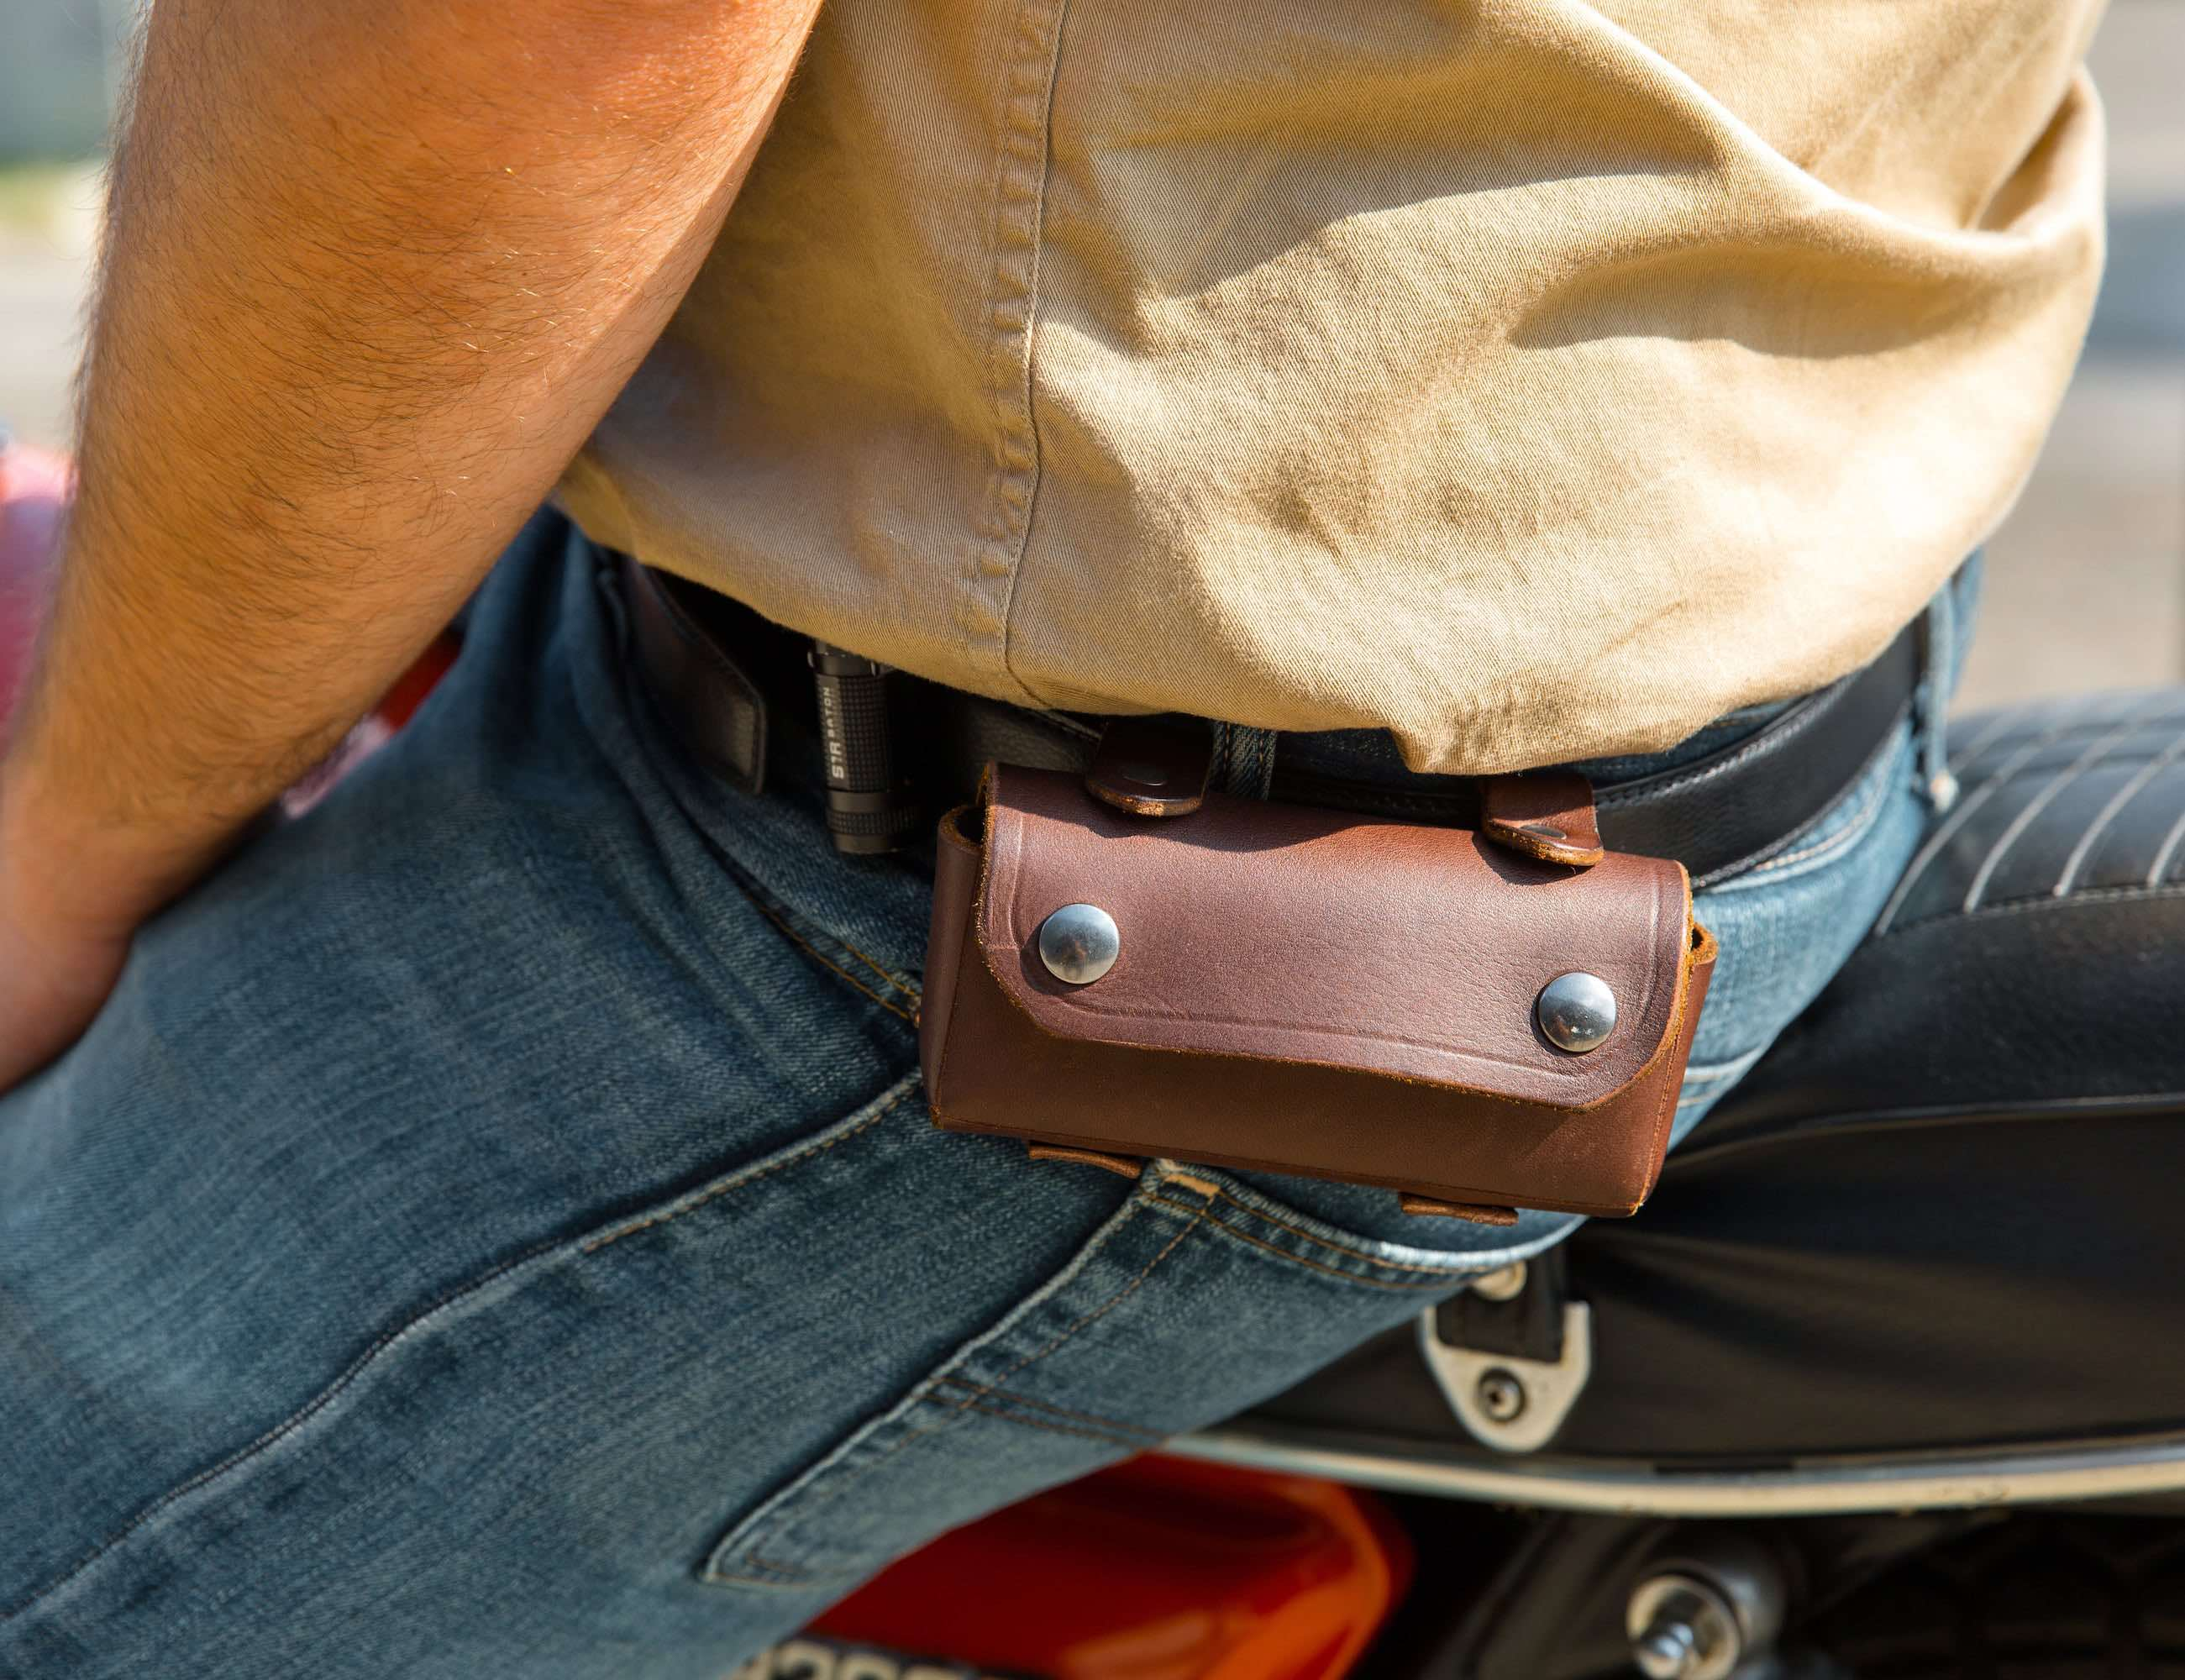 Toler UNION OMNILOCK Pocket Multi Tool